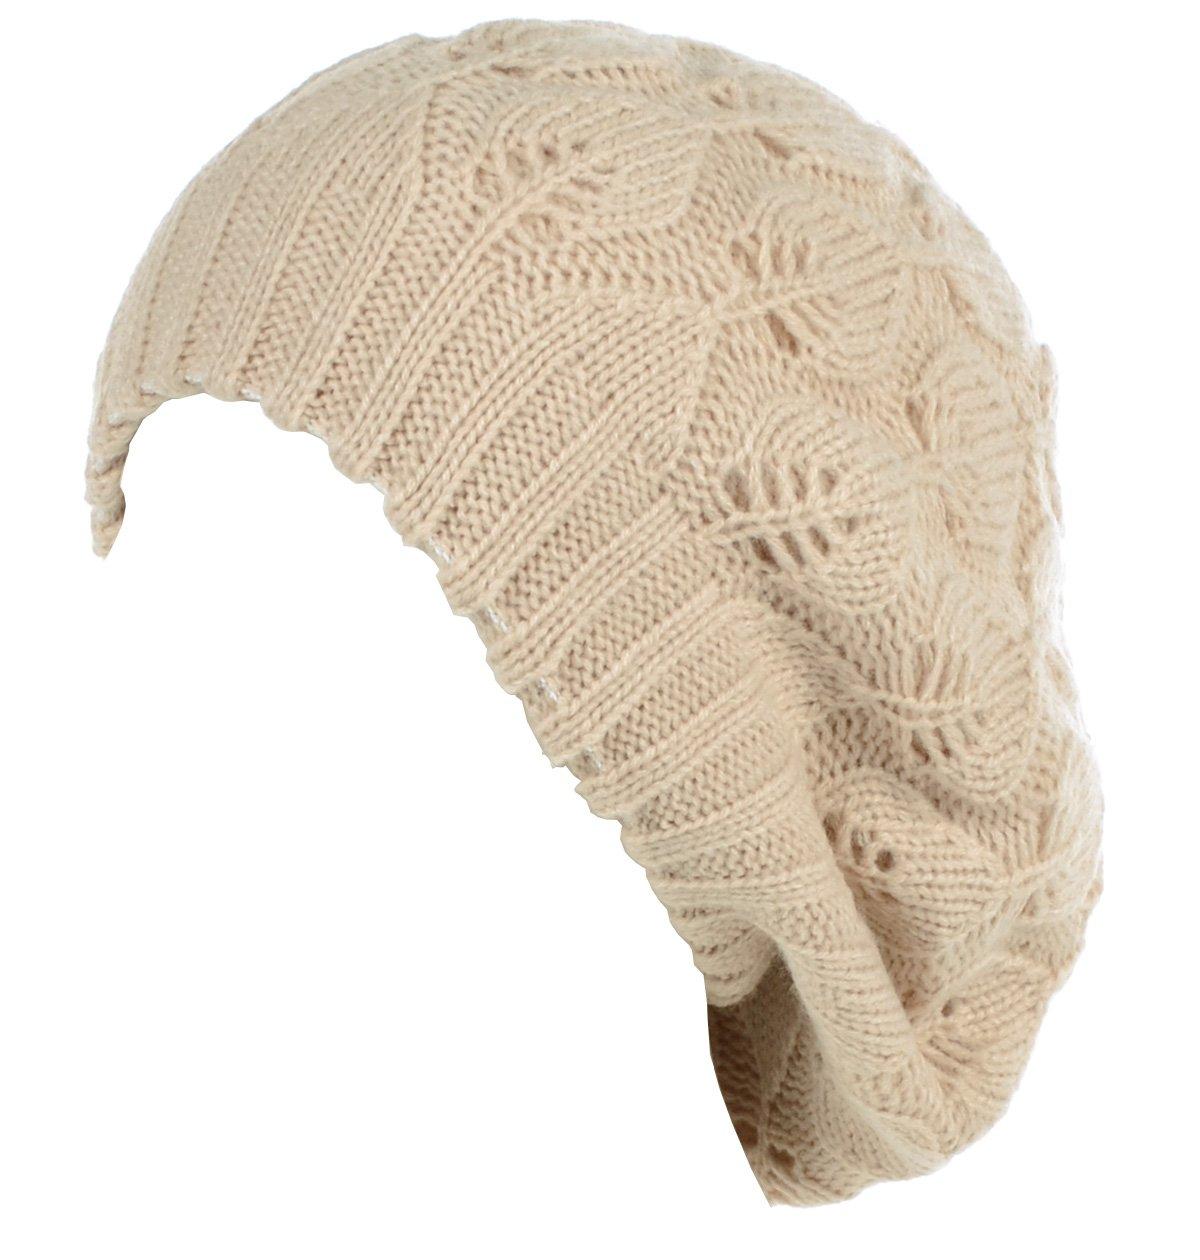 BYOS Winter Chic Warm Double Layer Leafy Cutout Crochet Knit Slouchy Beret Beanie Hat (Beige Leafy)